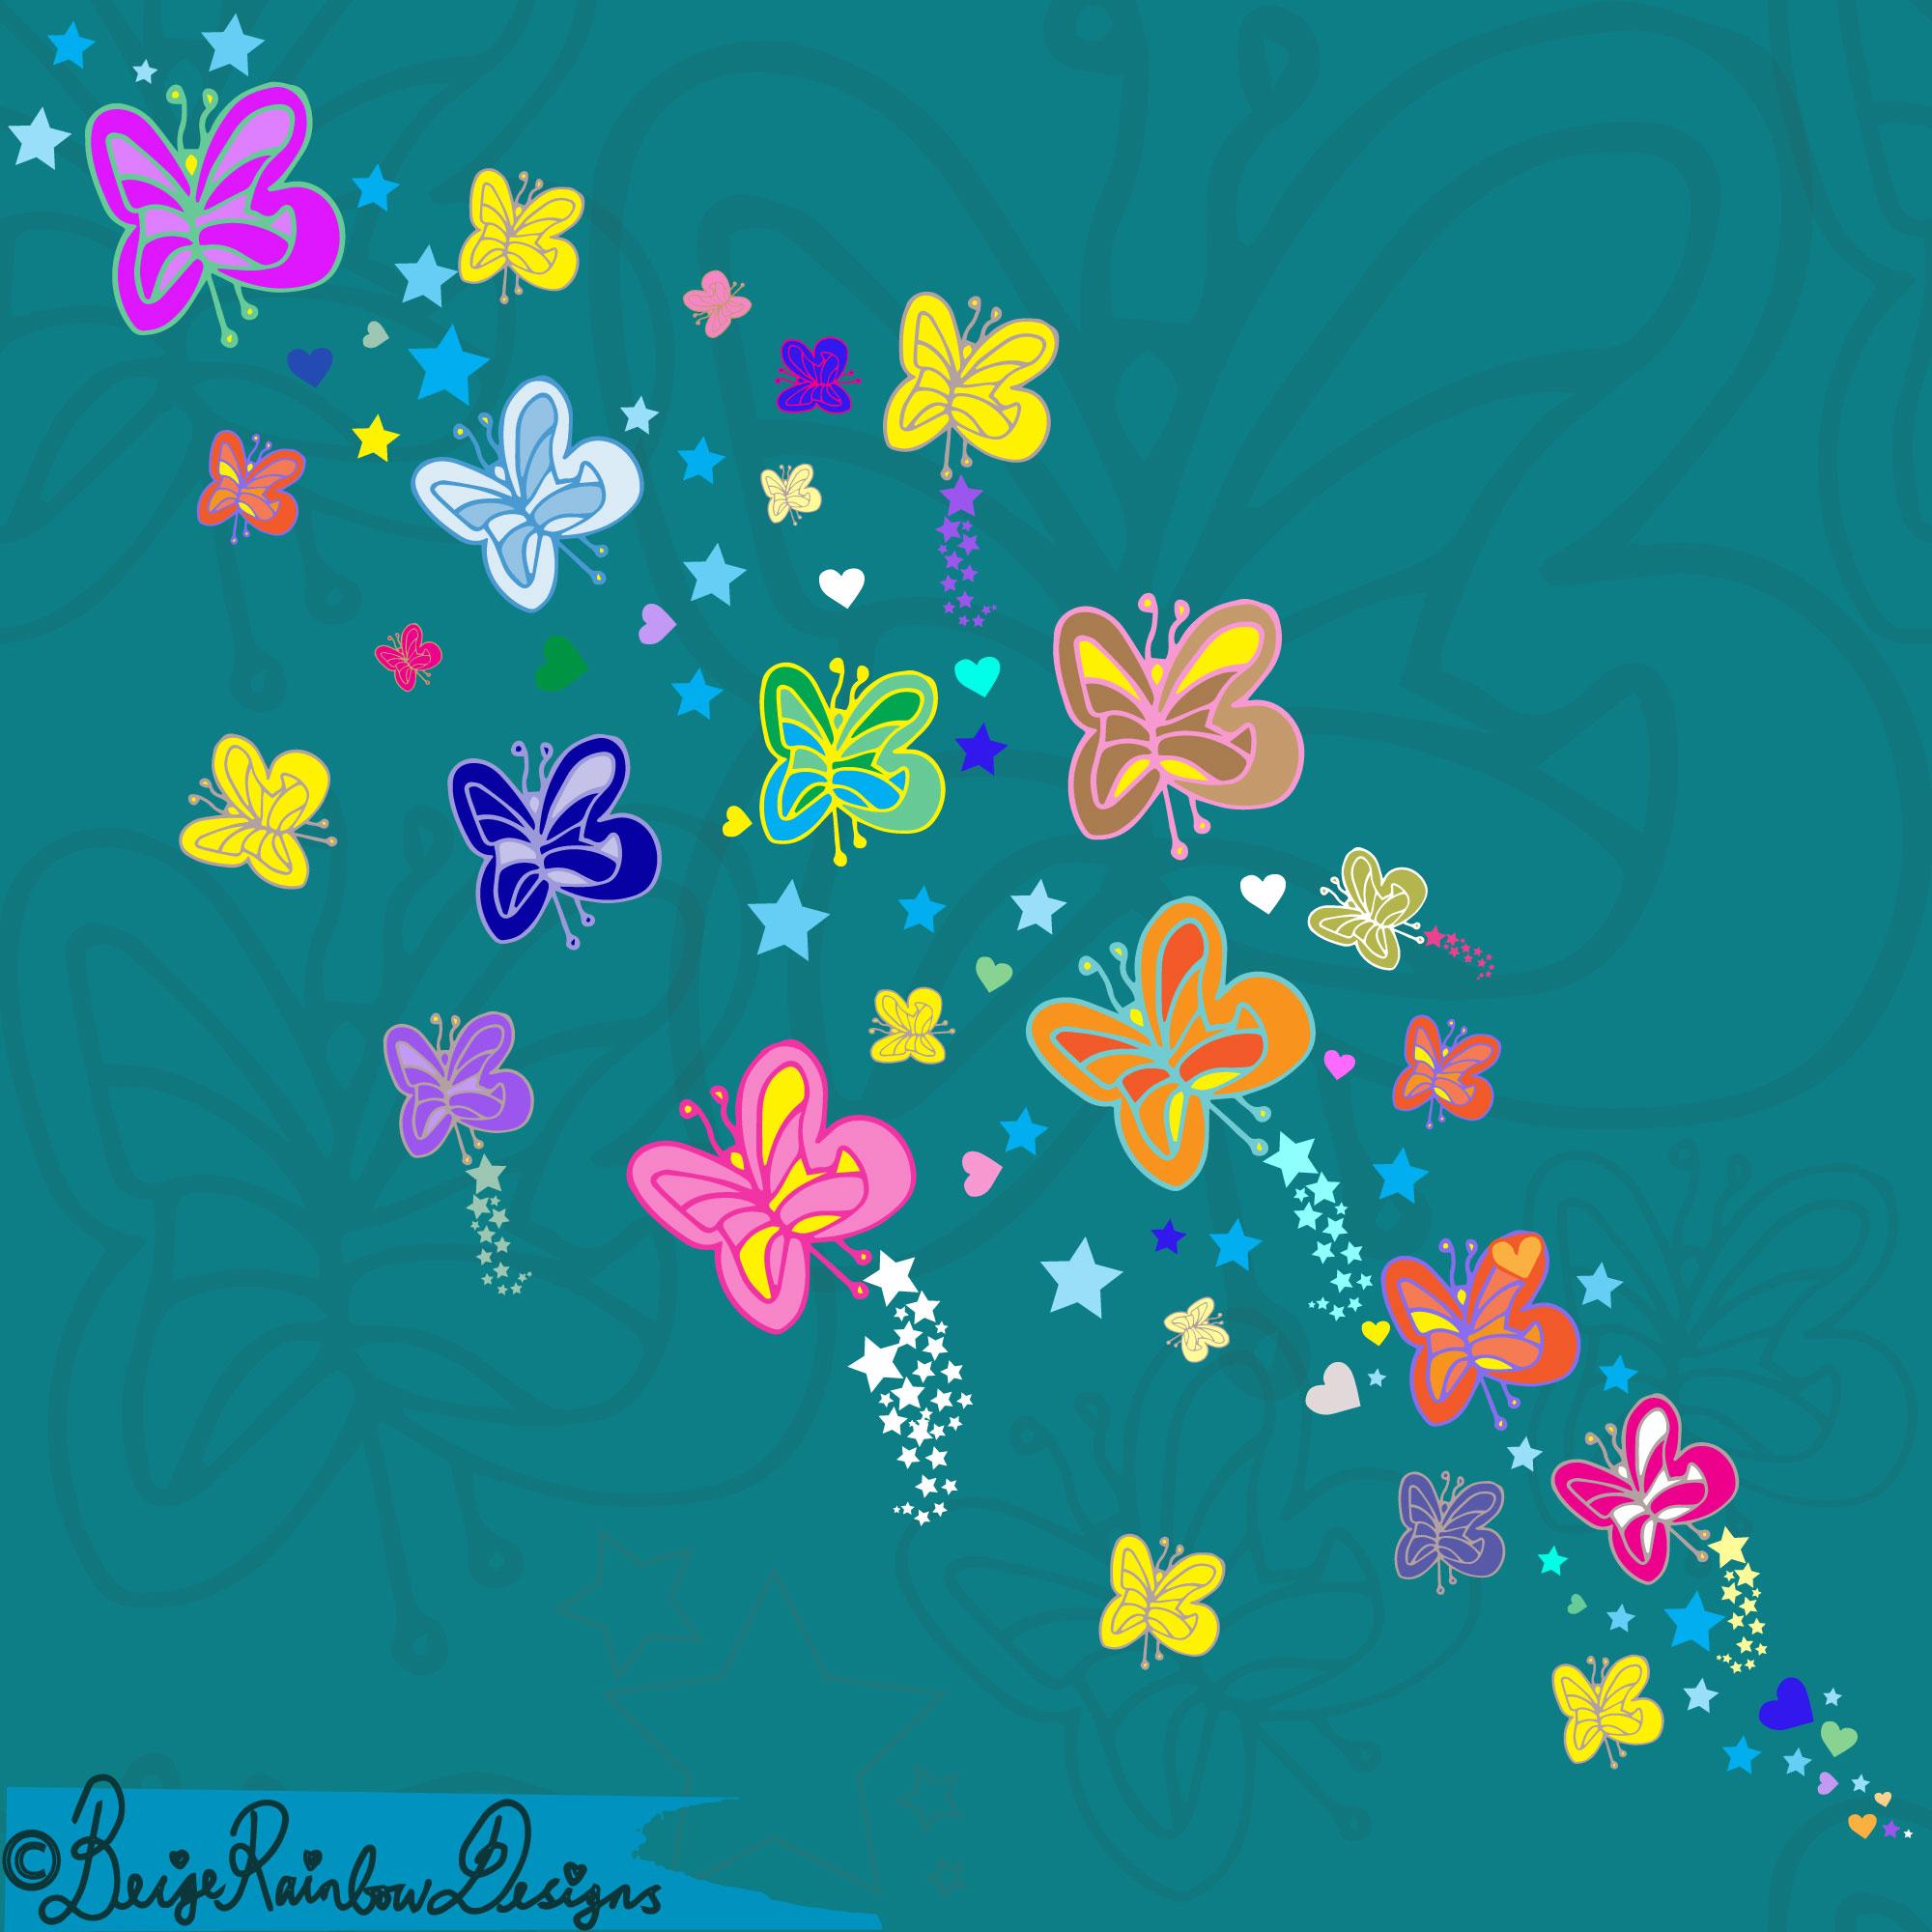 Butterfly-Flurry-for-webby.jpg